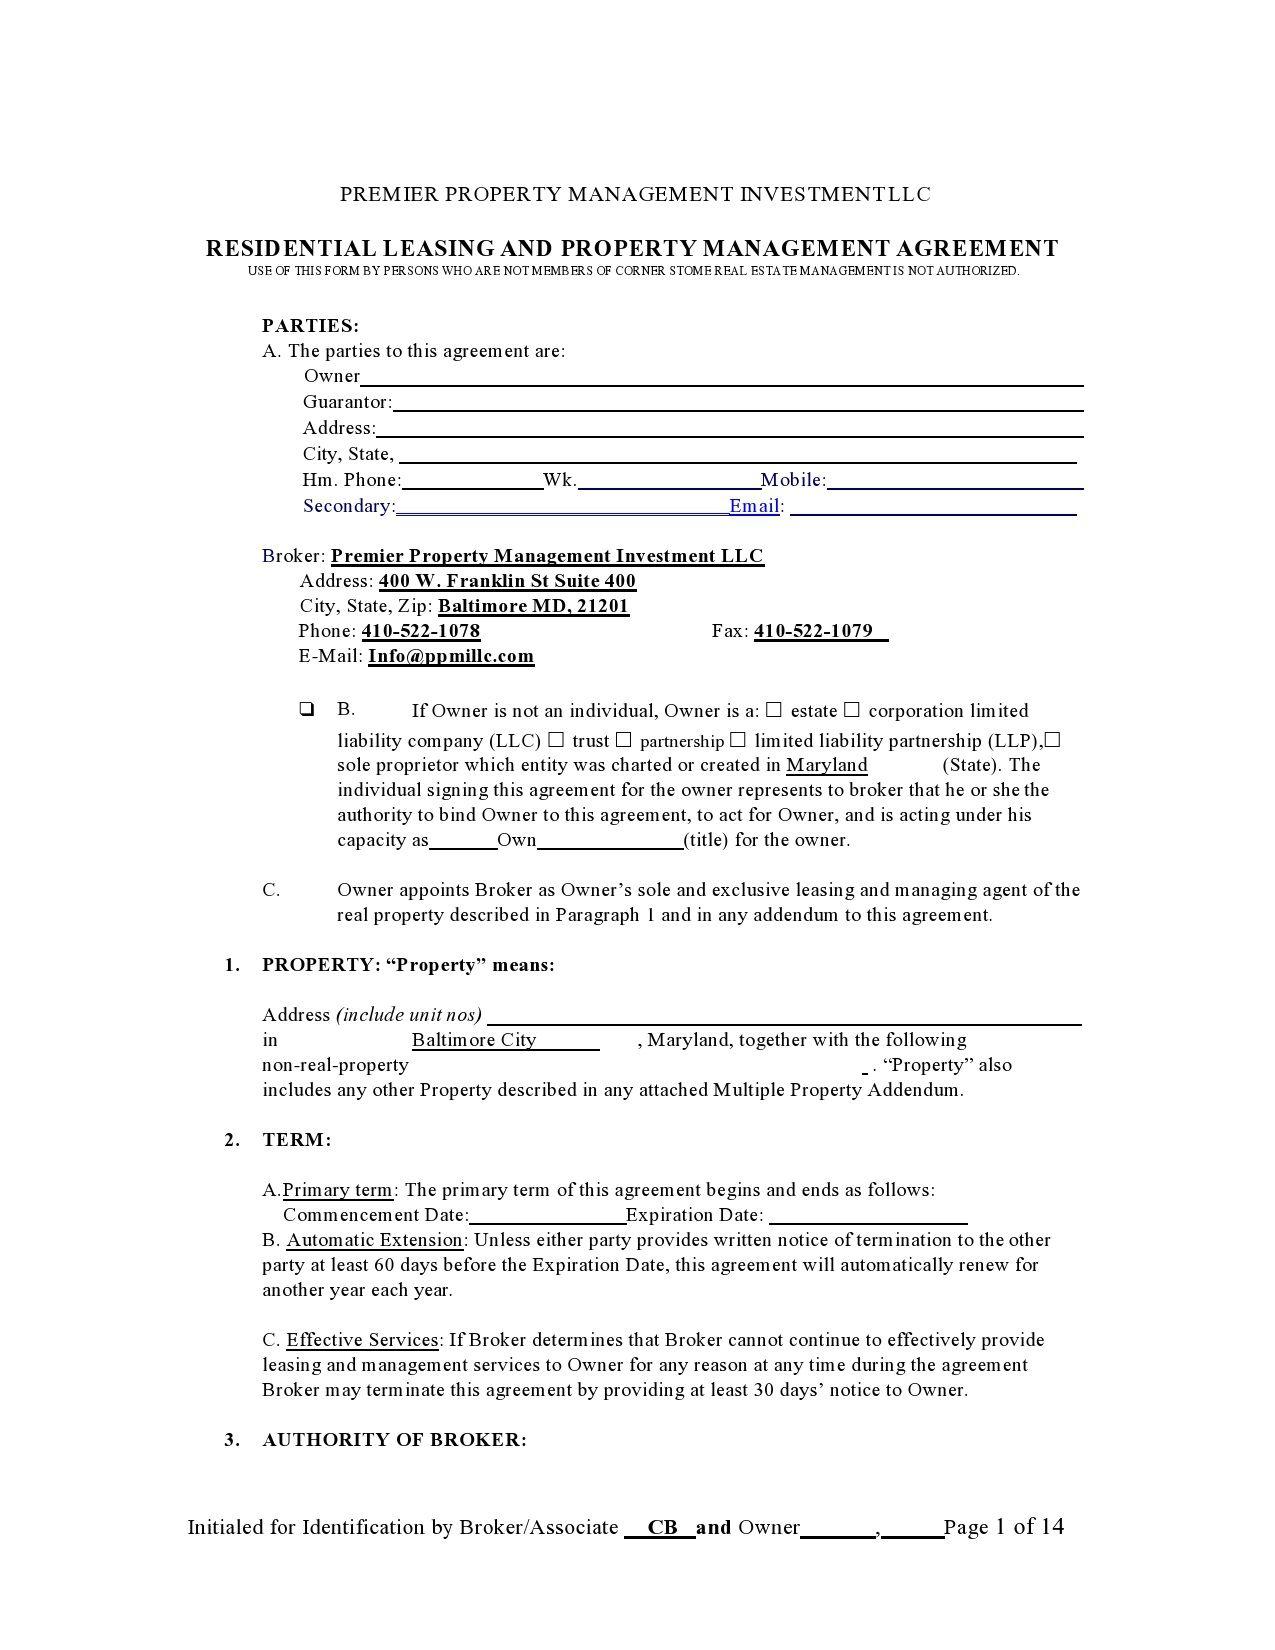 004 Impressive Commercial Property Management Agreement Template Uk Concept Full